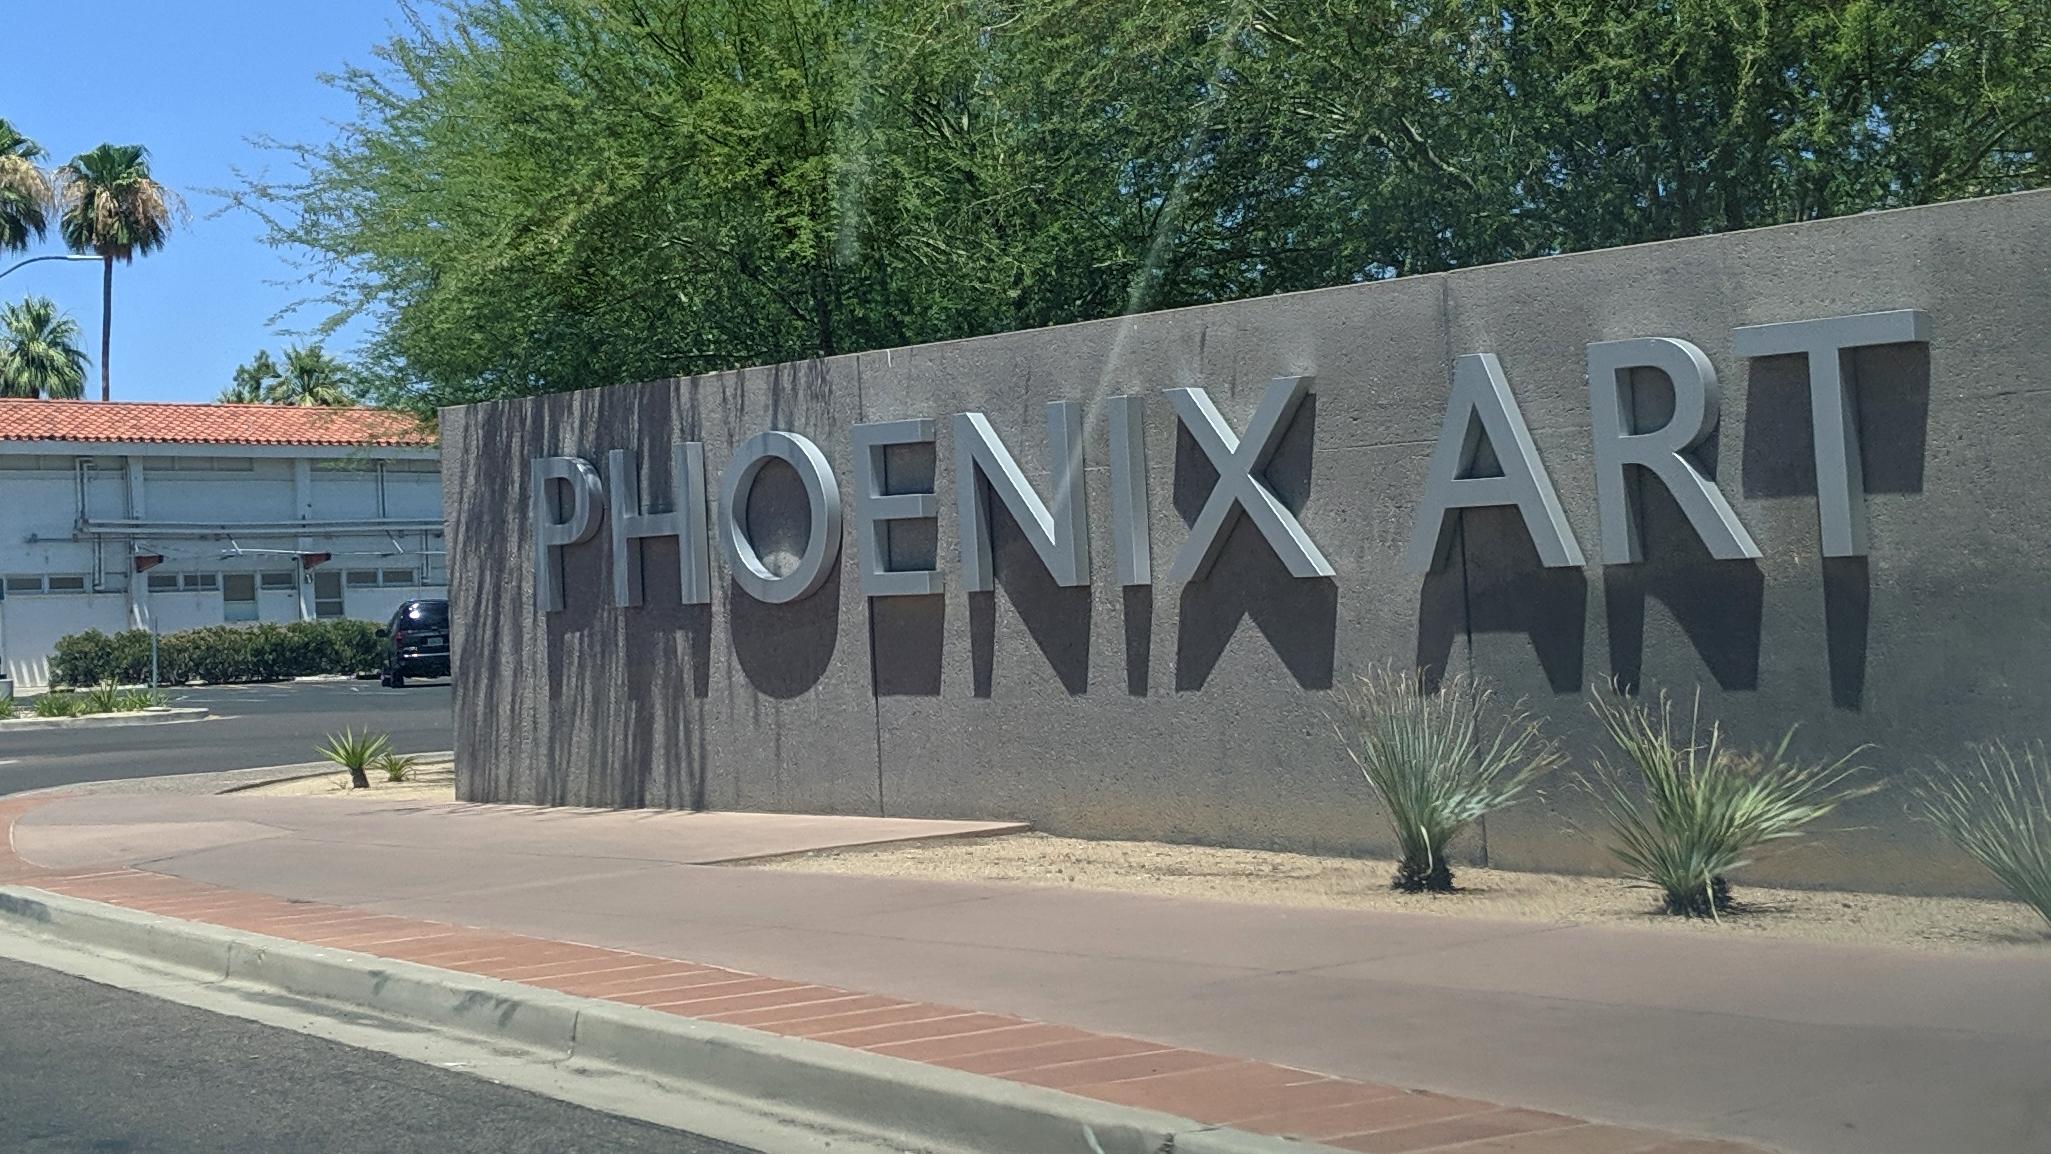 Phoenix Art Museum sign